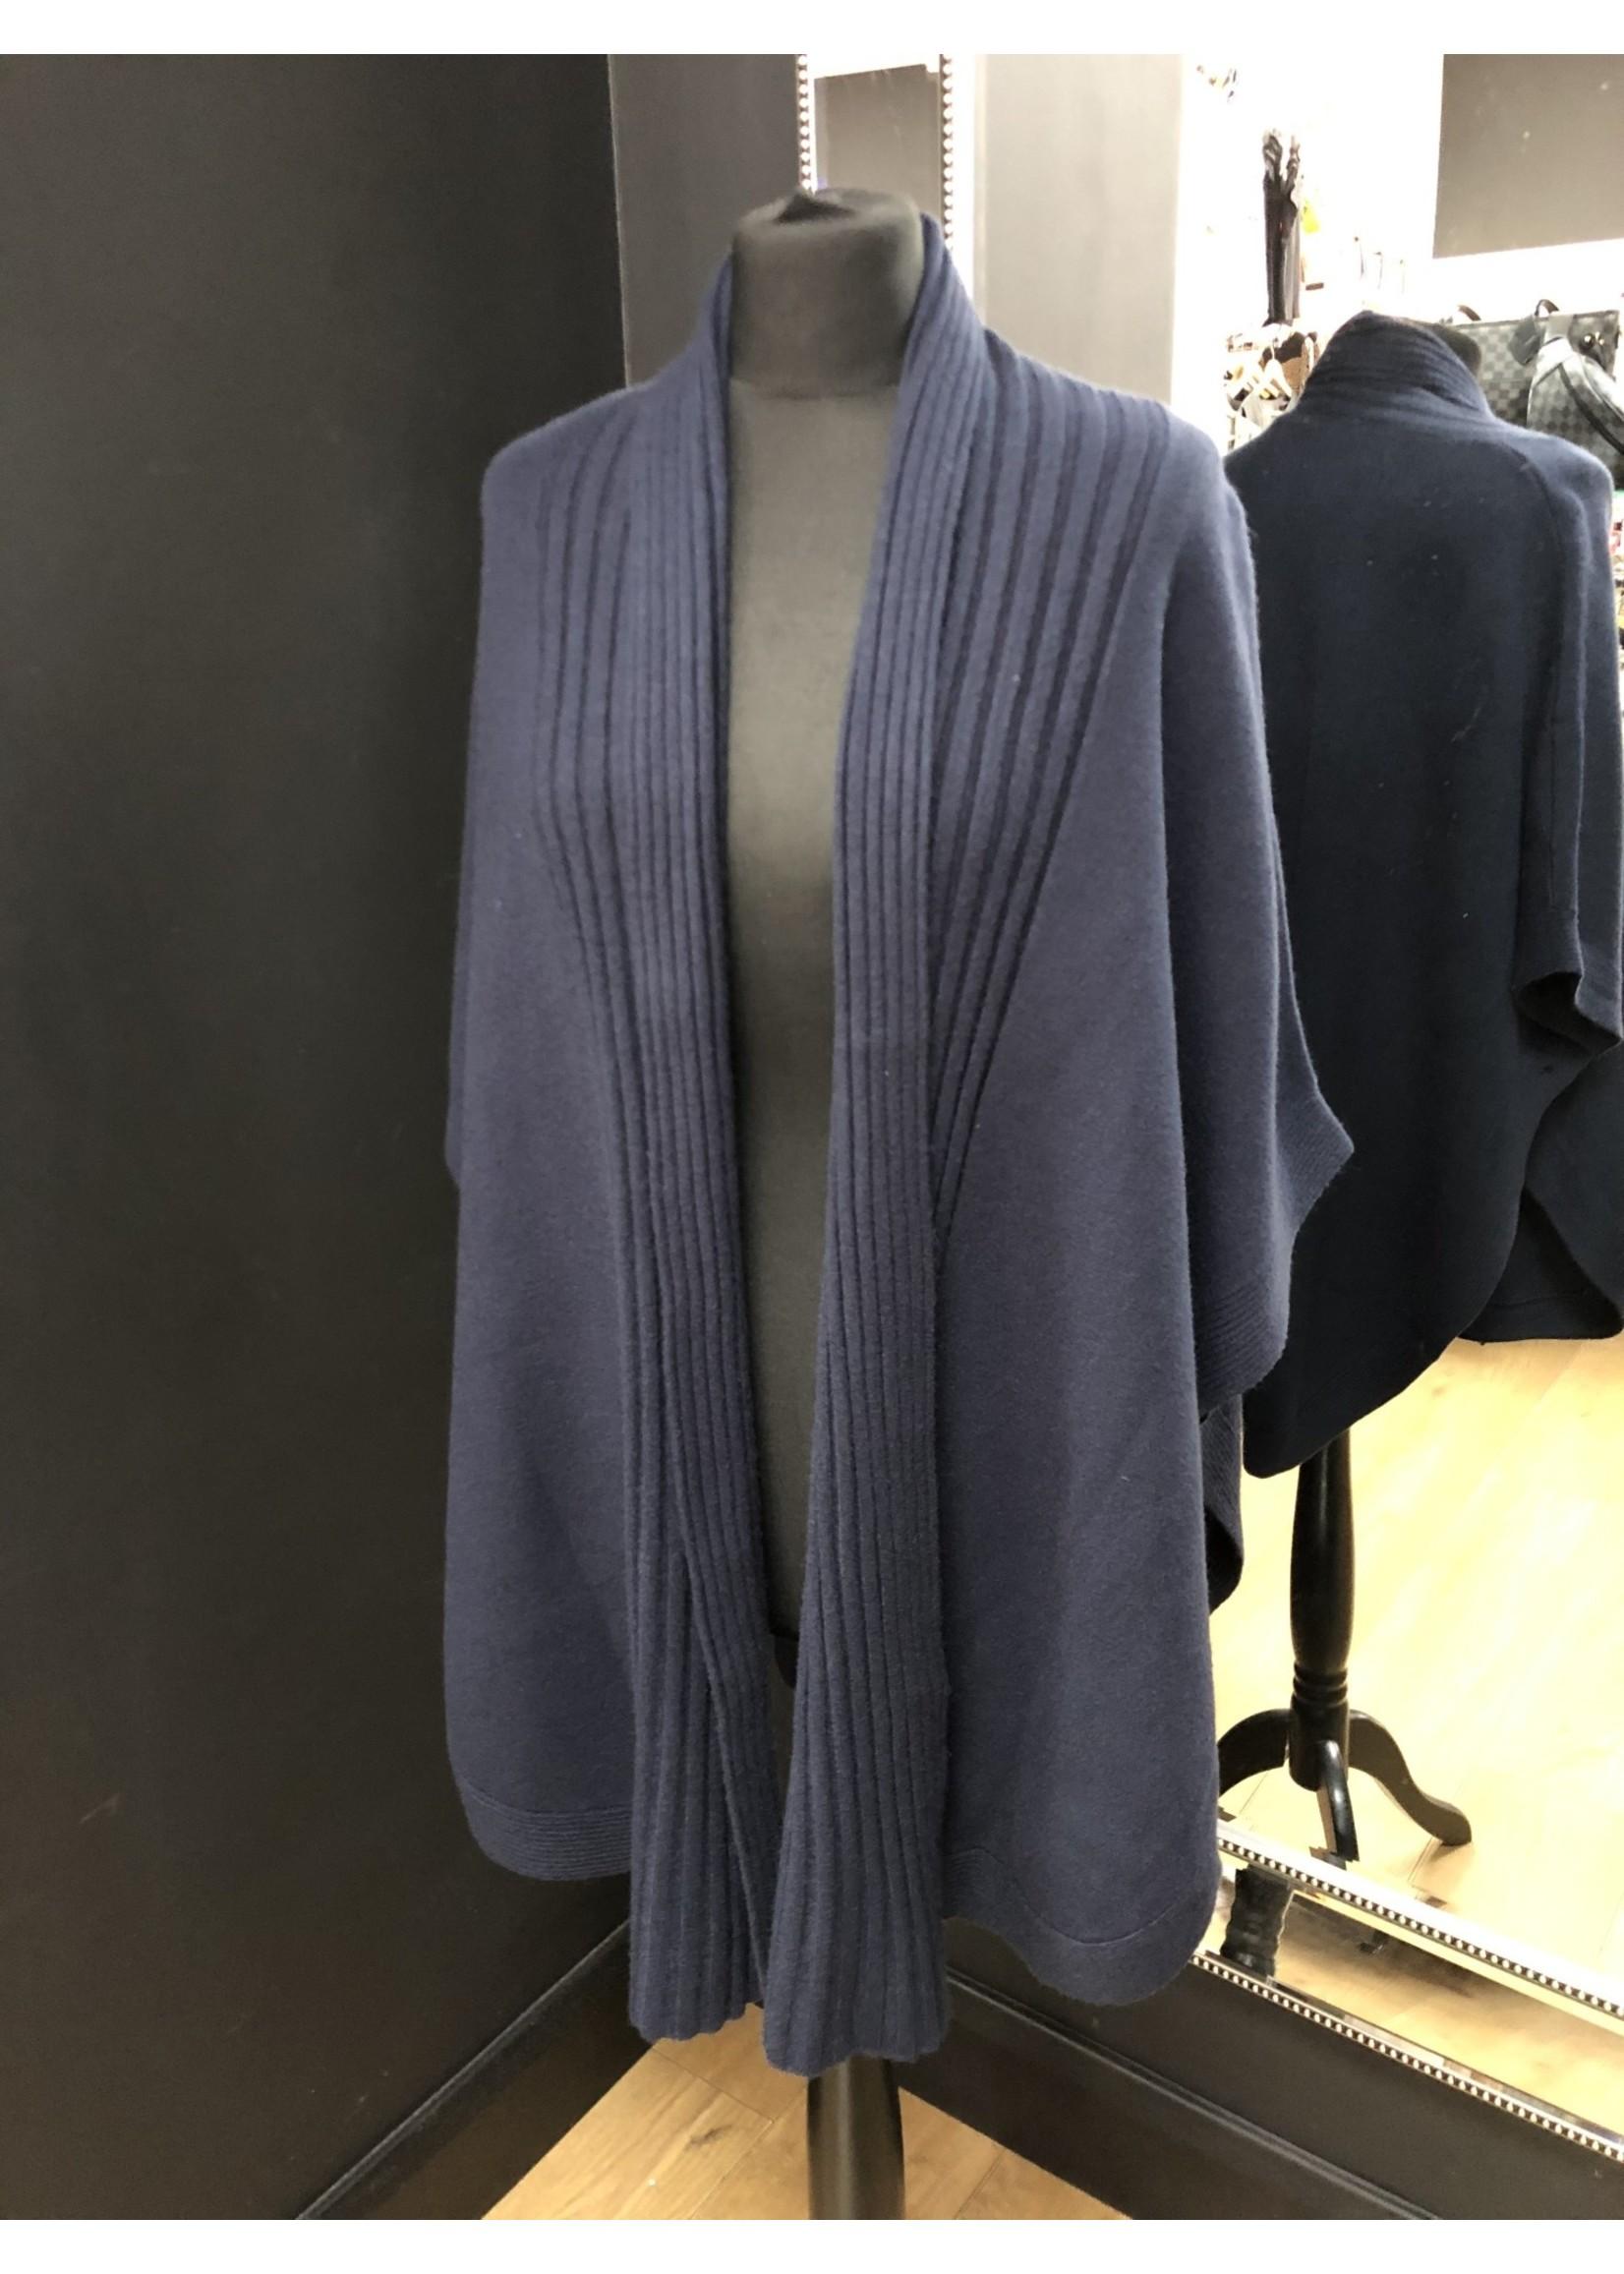 Sonia edge to edge sleeveless  cardigan